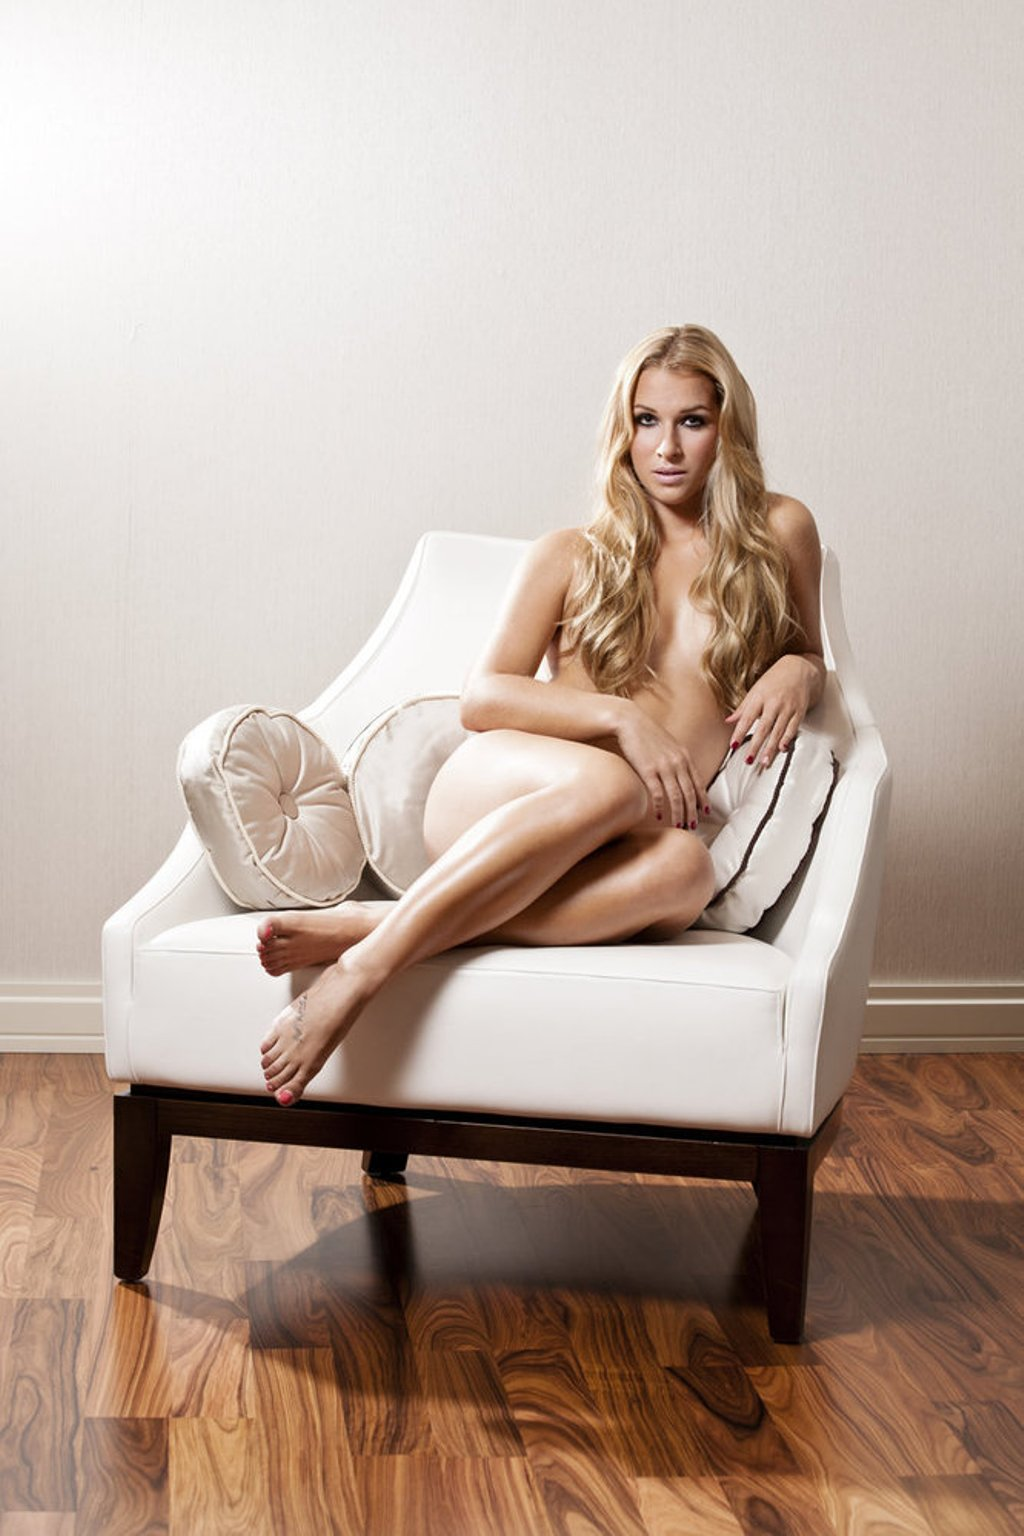 pictures Dominika Cibulkova Nude Photos and Videos